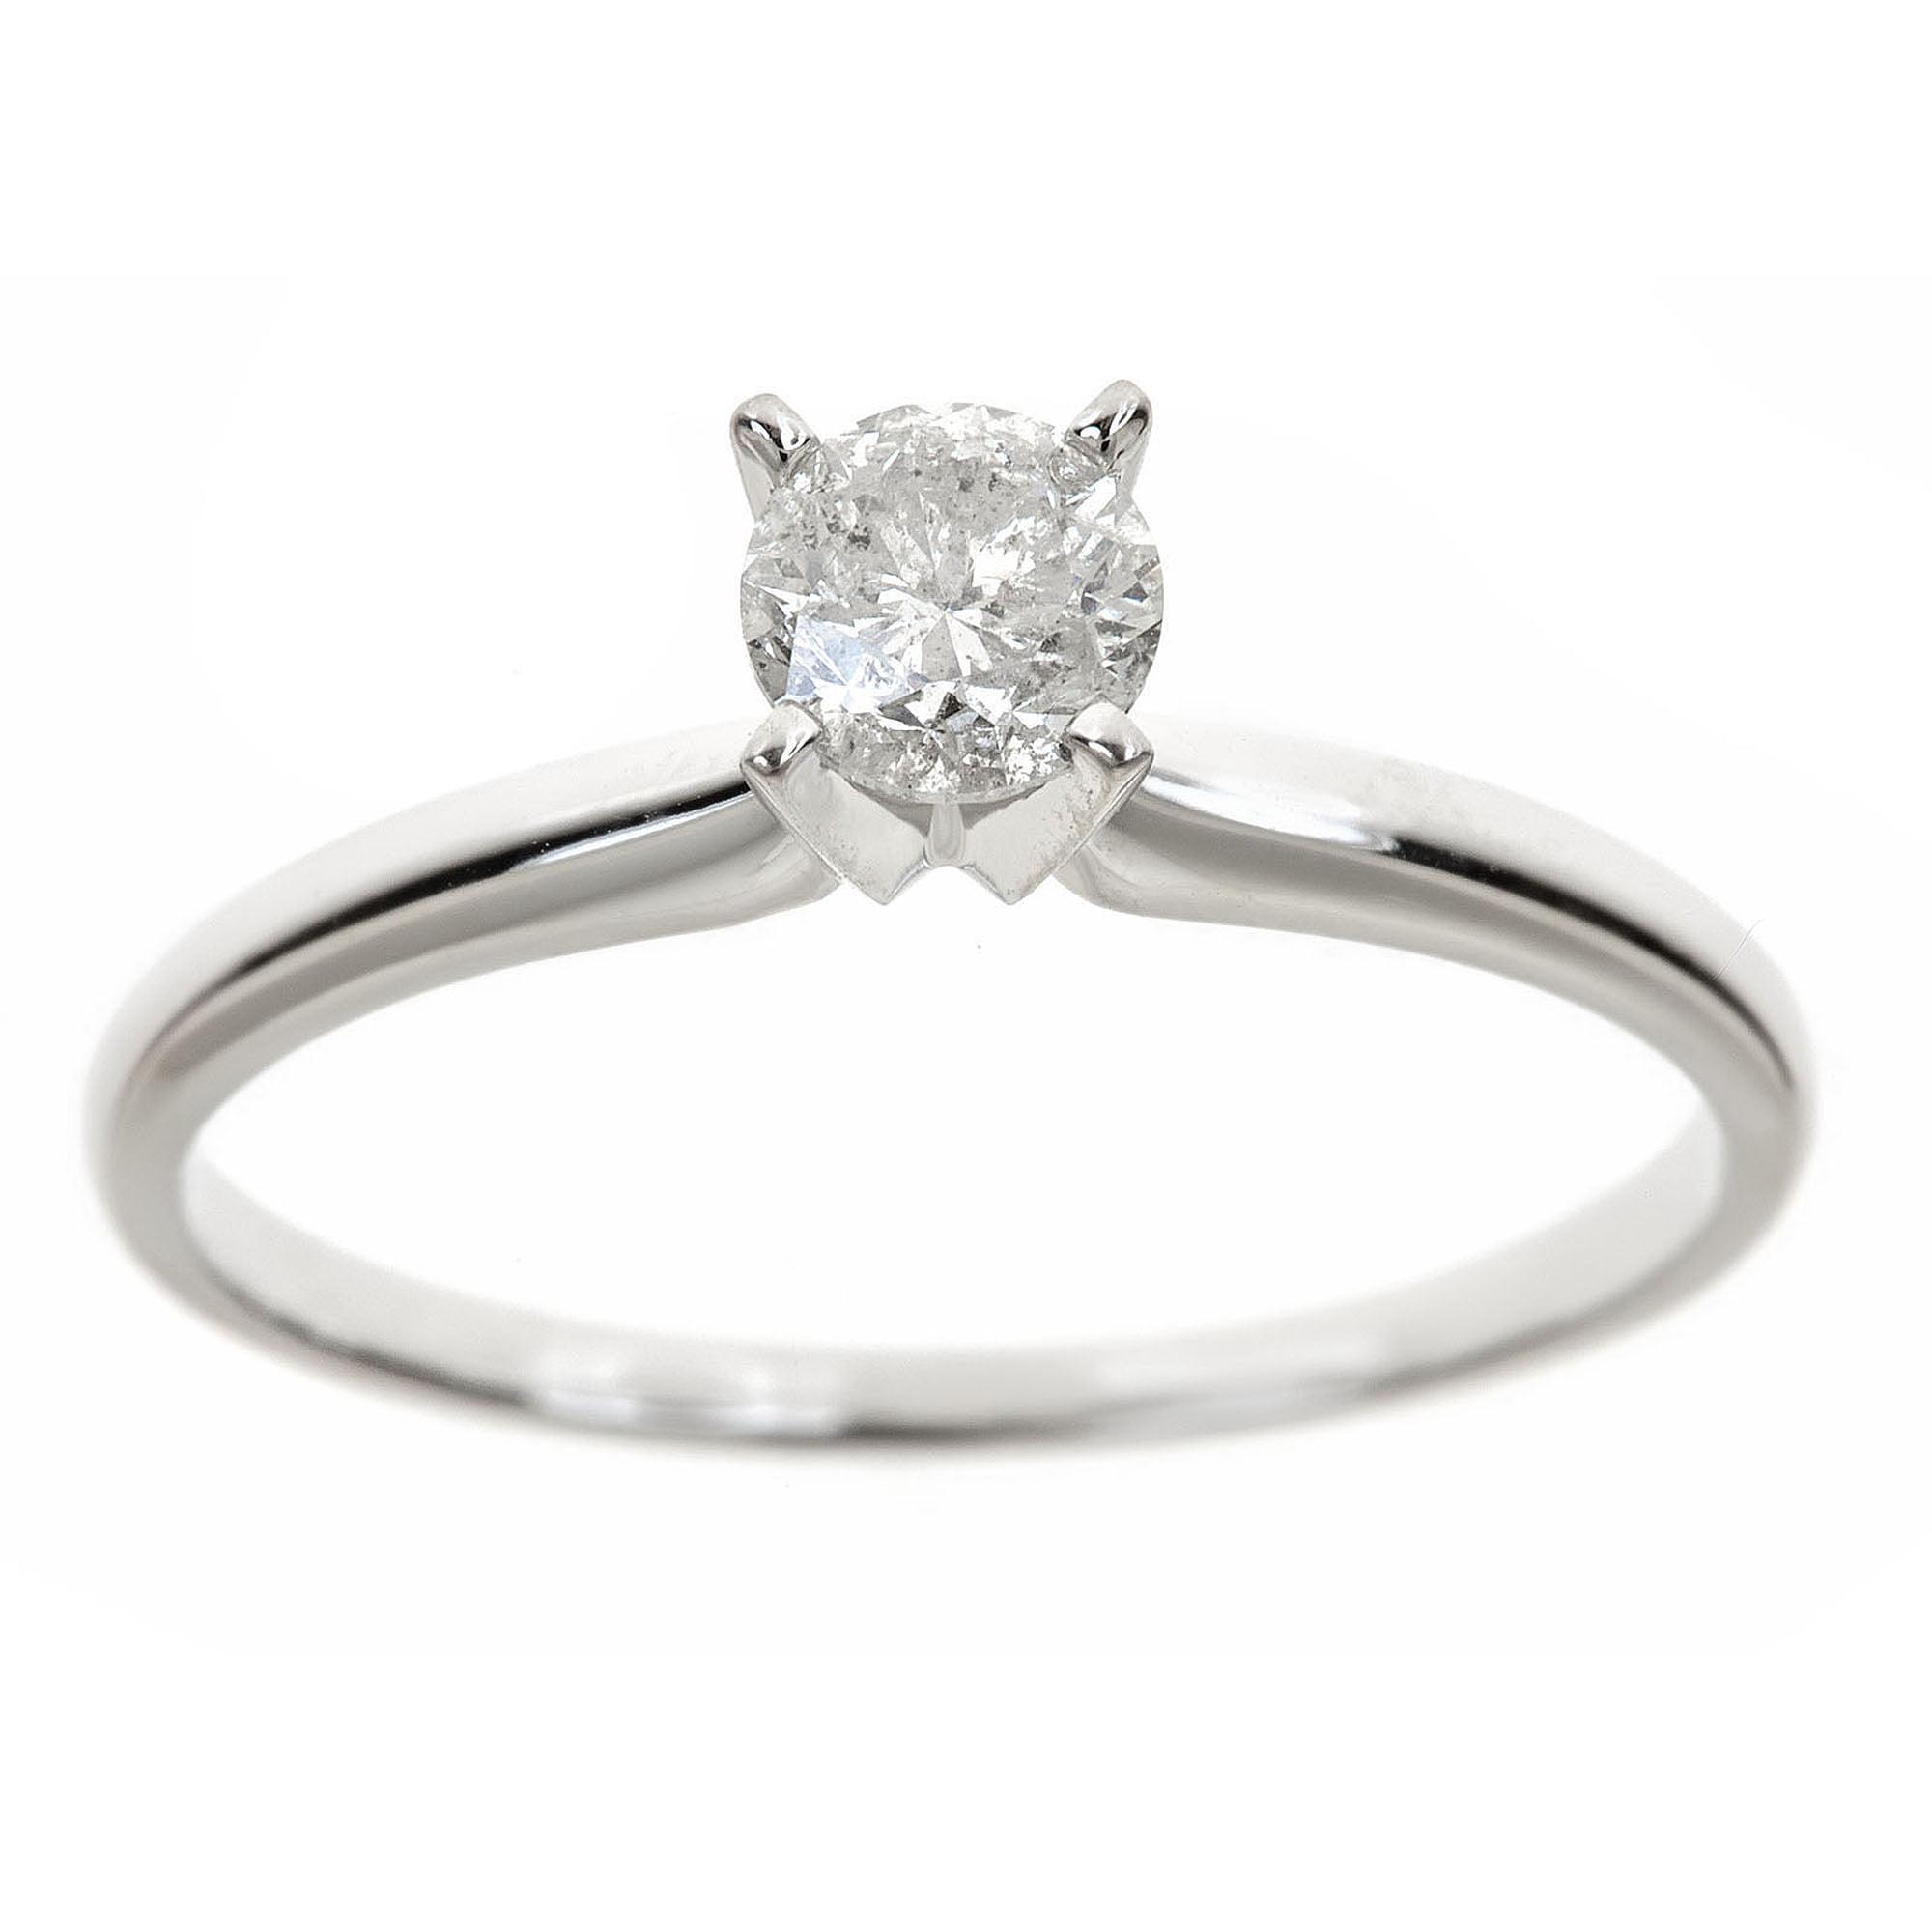 05 Carat TW Round White Diamond 14kt White Gold Solitaire Ring